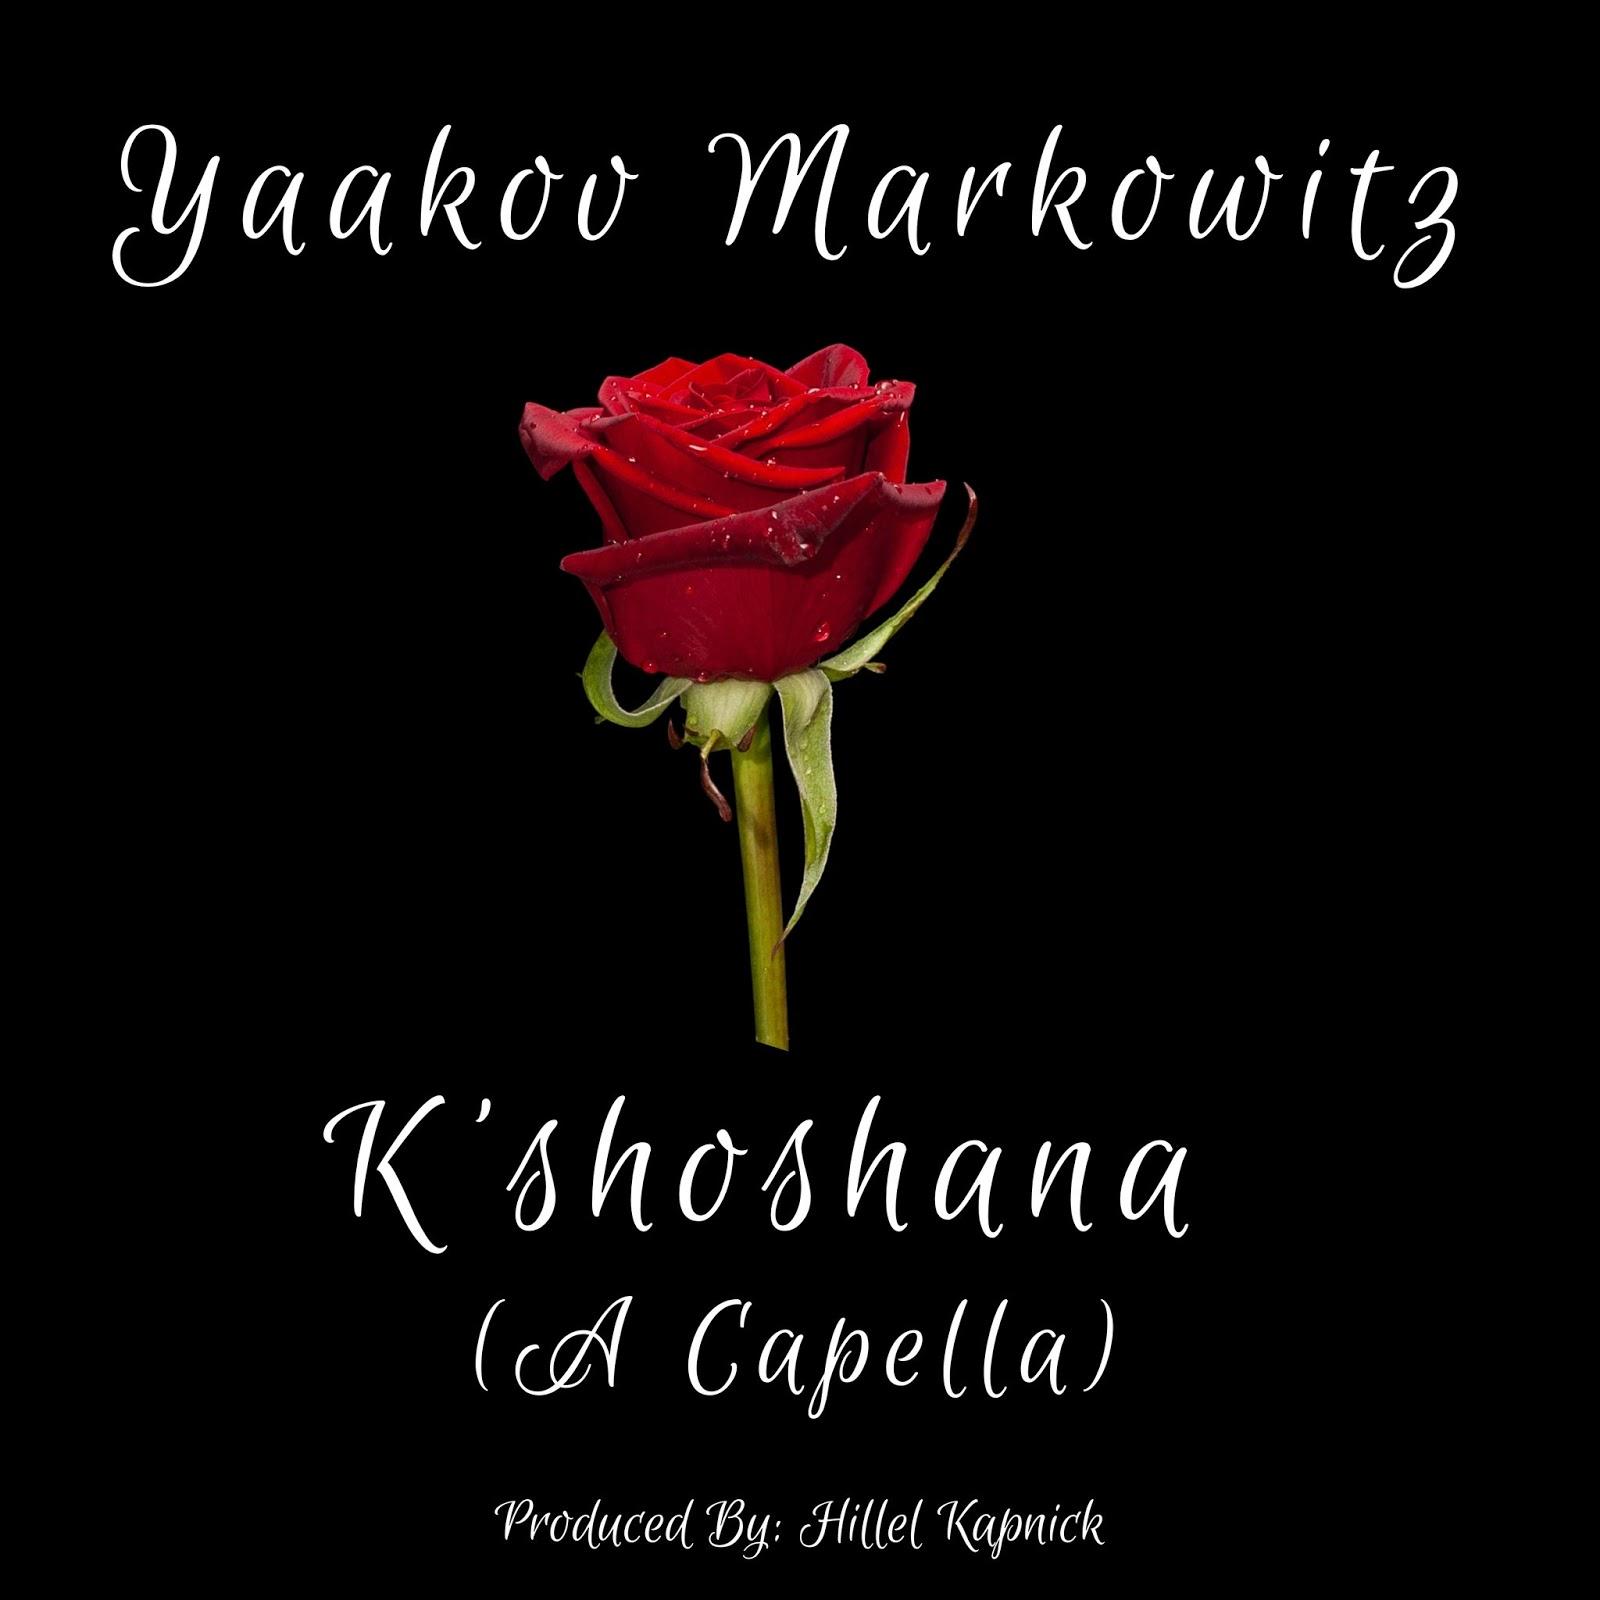 Yaakov Markowitz - K'shoshana (Acapella Cover)   Yehudas Jewish